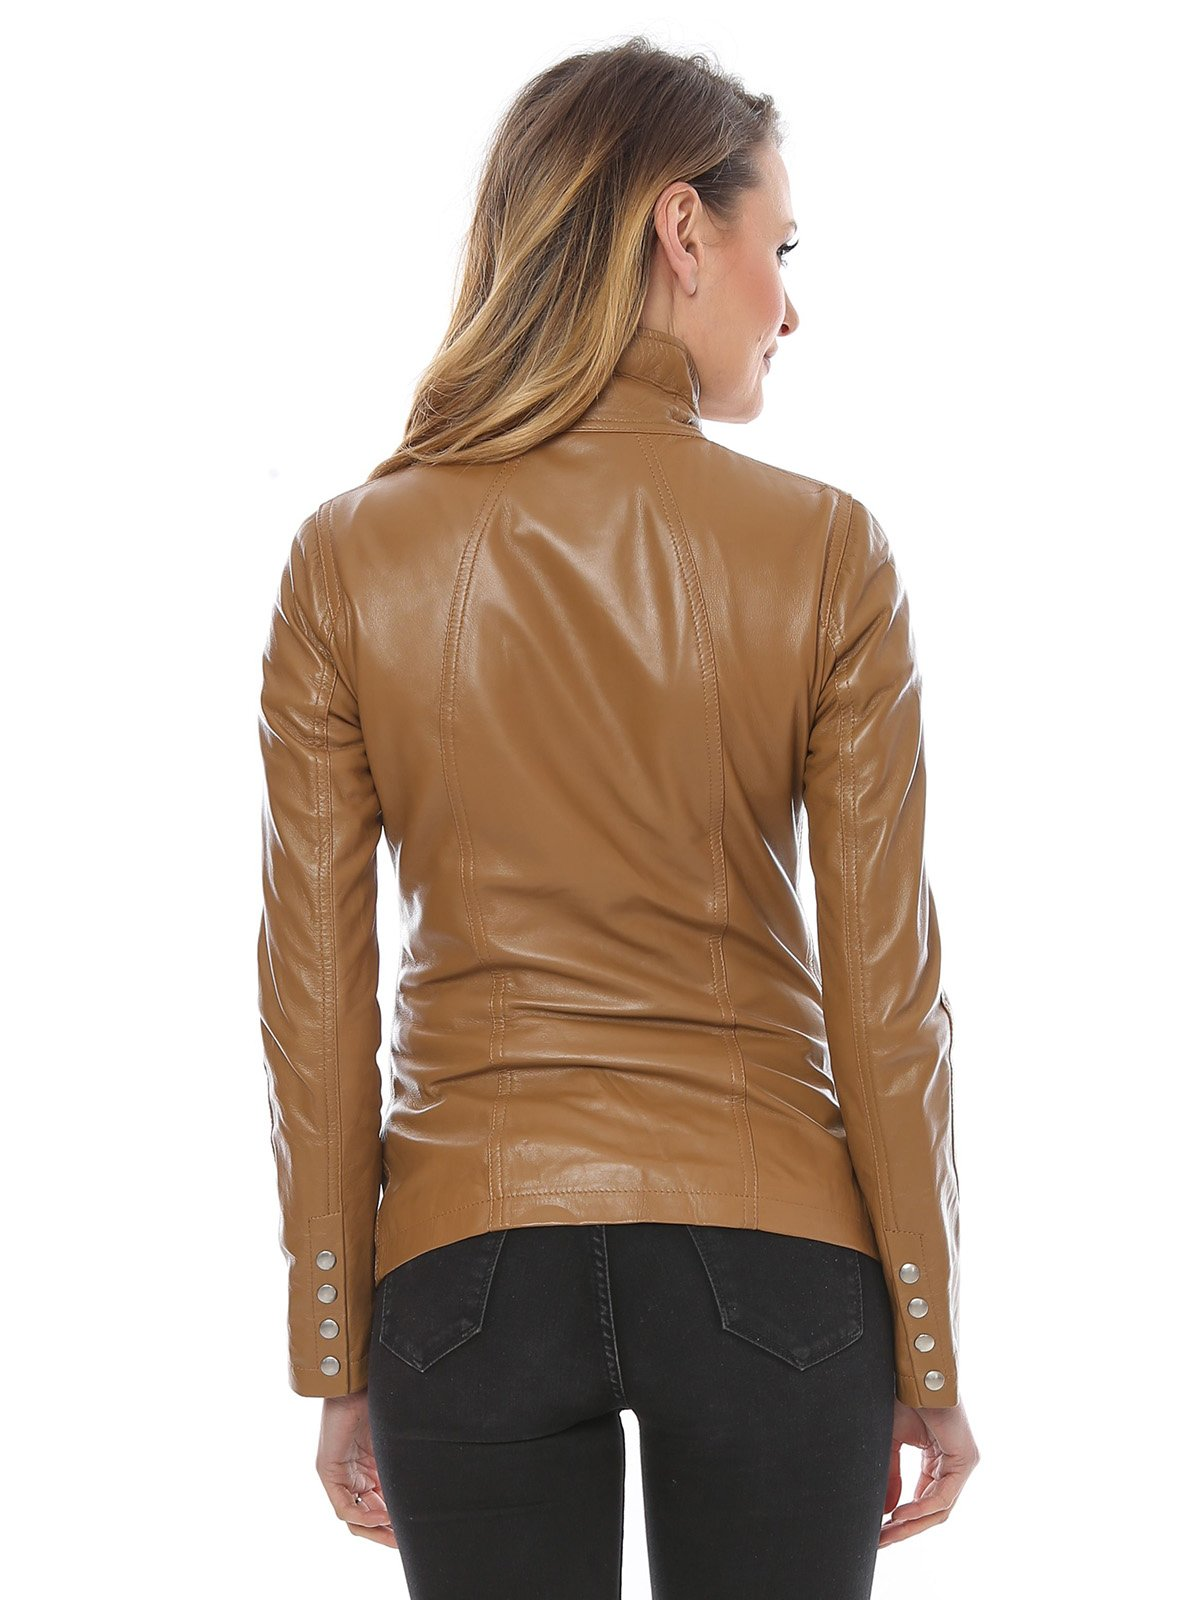 Куртка коньячного цвета | 3010592 | фото 2